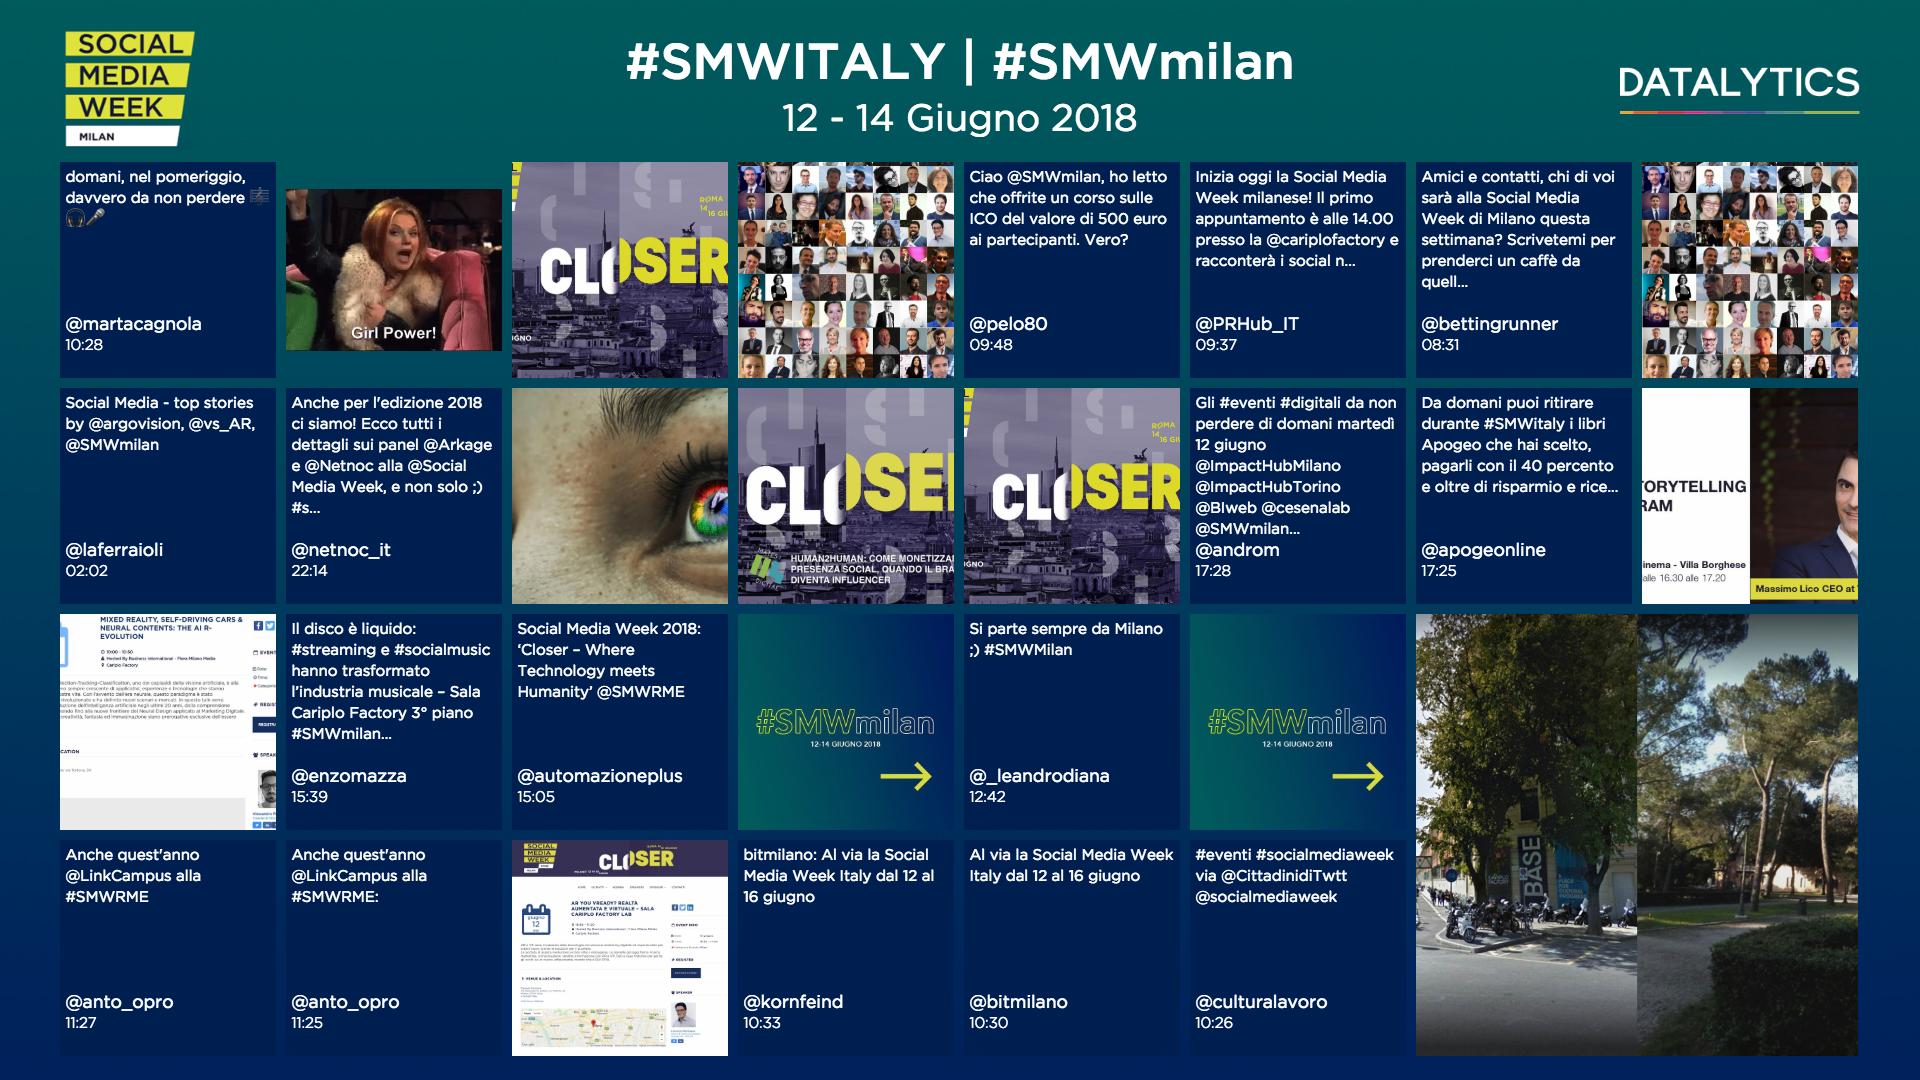 socialmediaweek2018wall